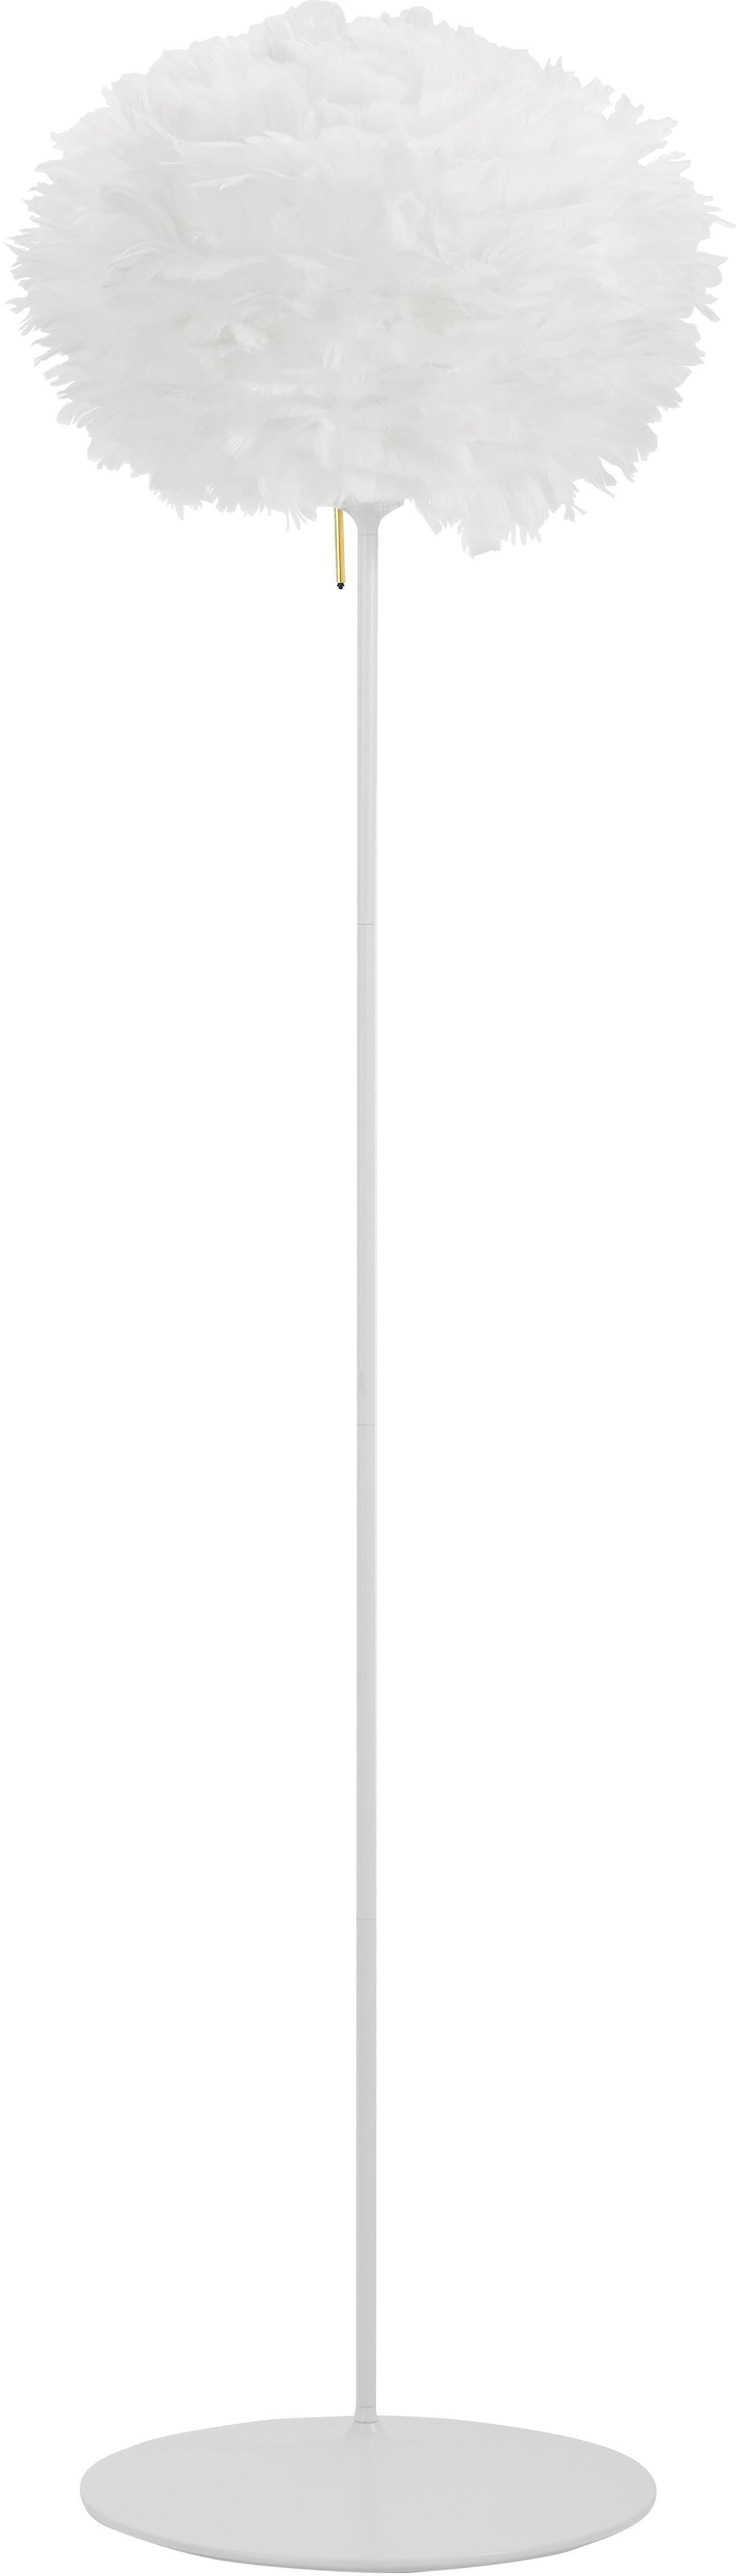 Lámpara de pie de plumas Eos, Pantalla: plumas de ganso, acero, Blanco, Ø 45 x Al 170 cm